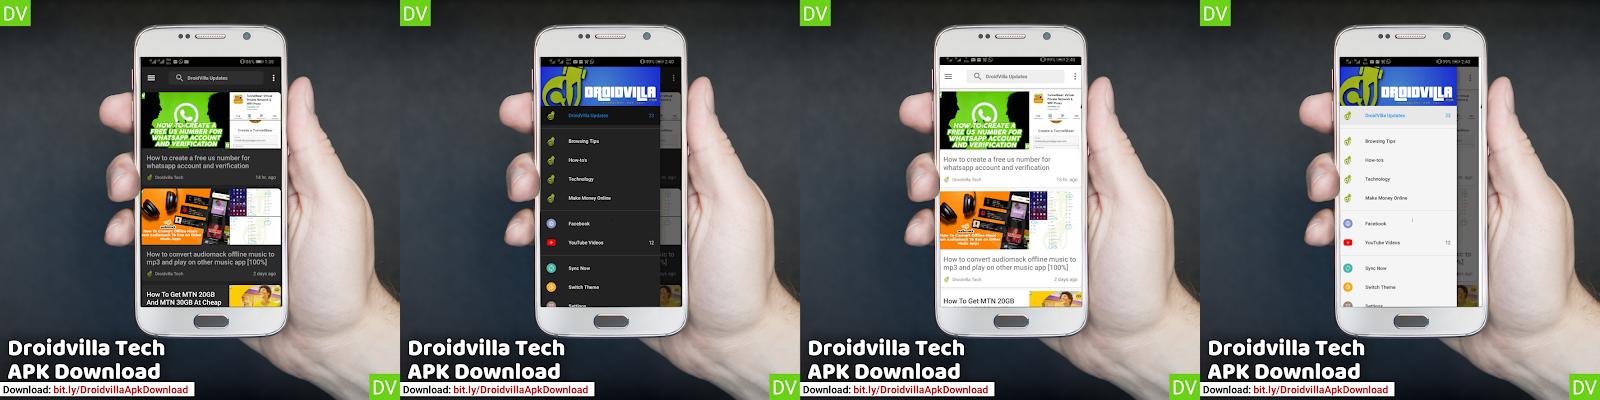 Droidvilla Tech apk download